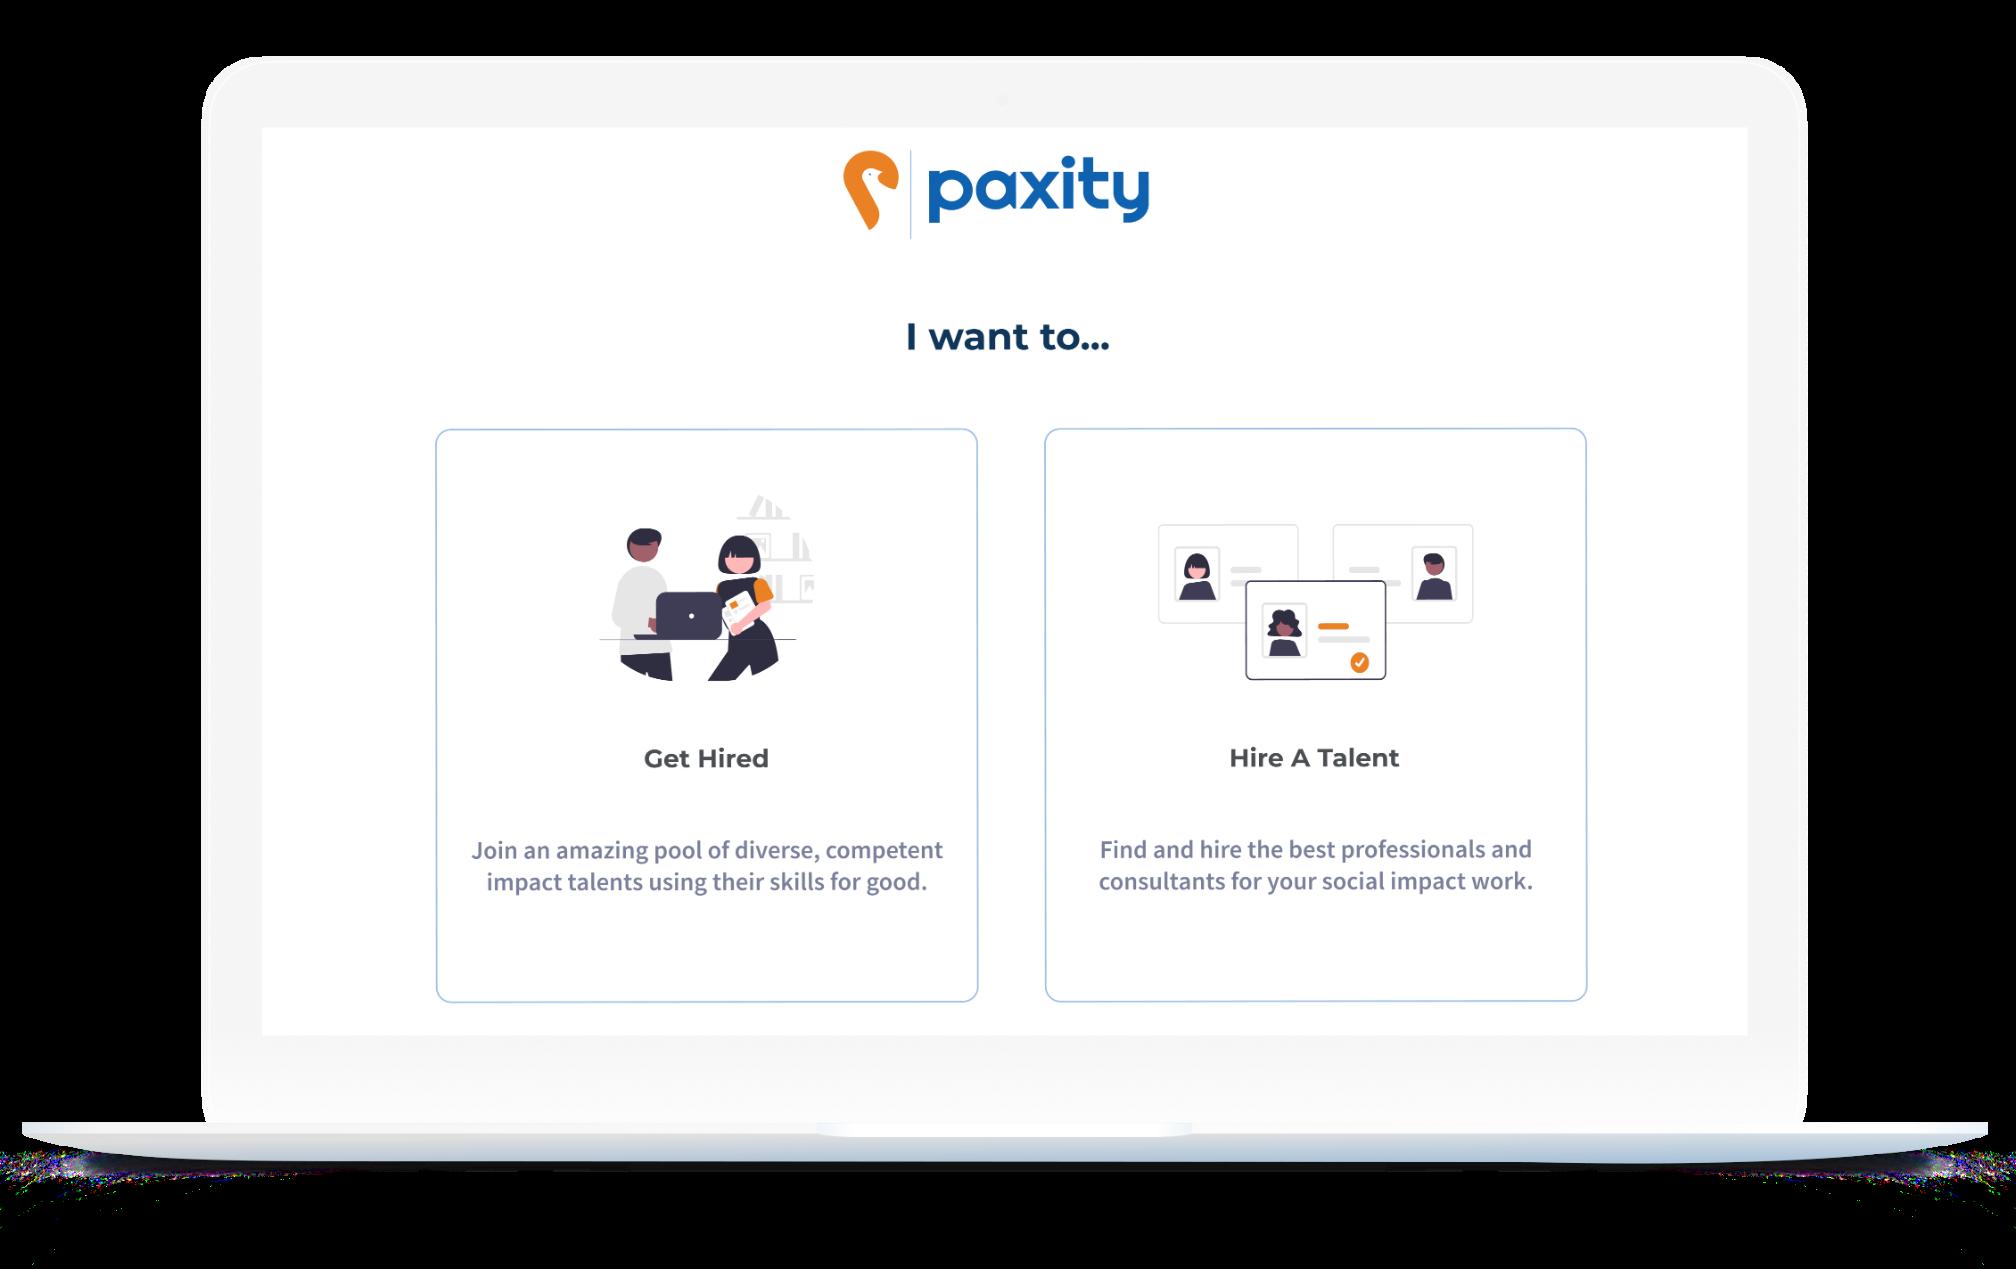 Paxity landing page mockup